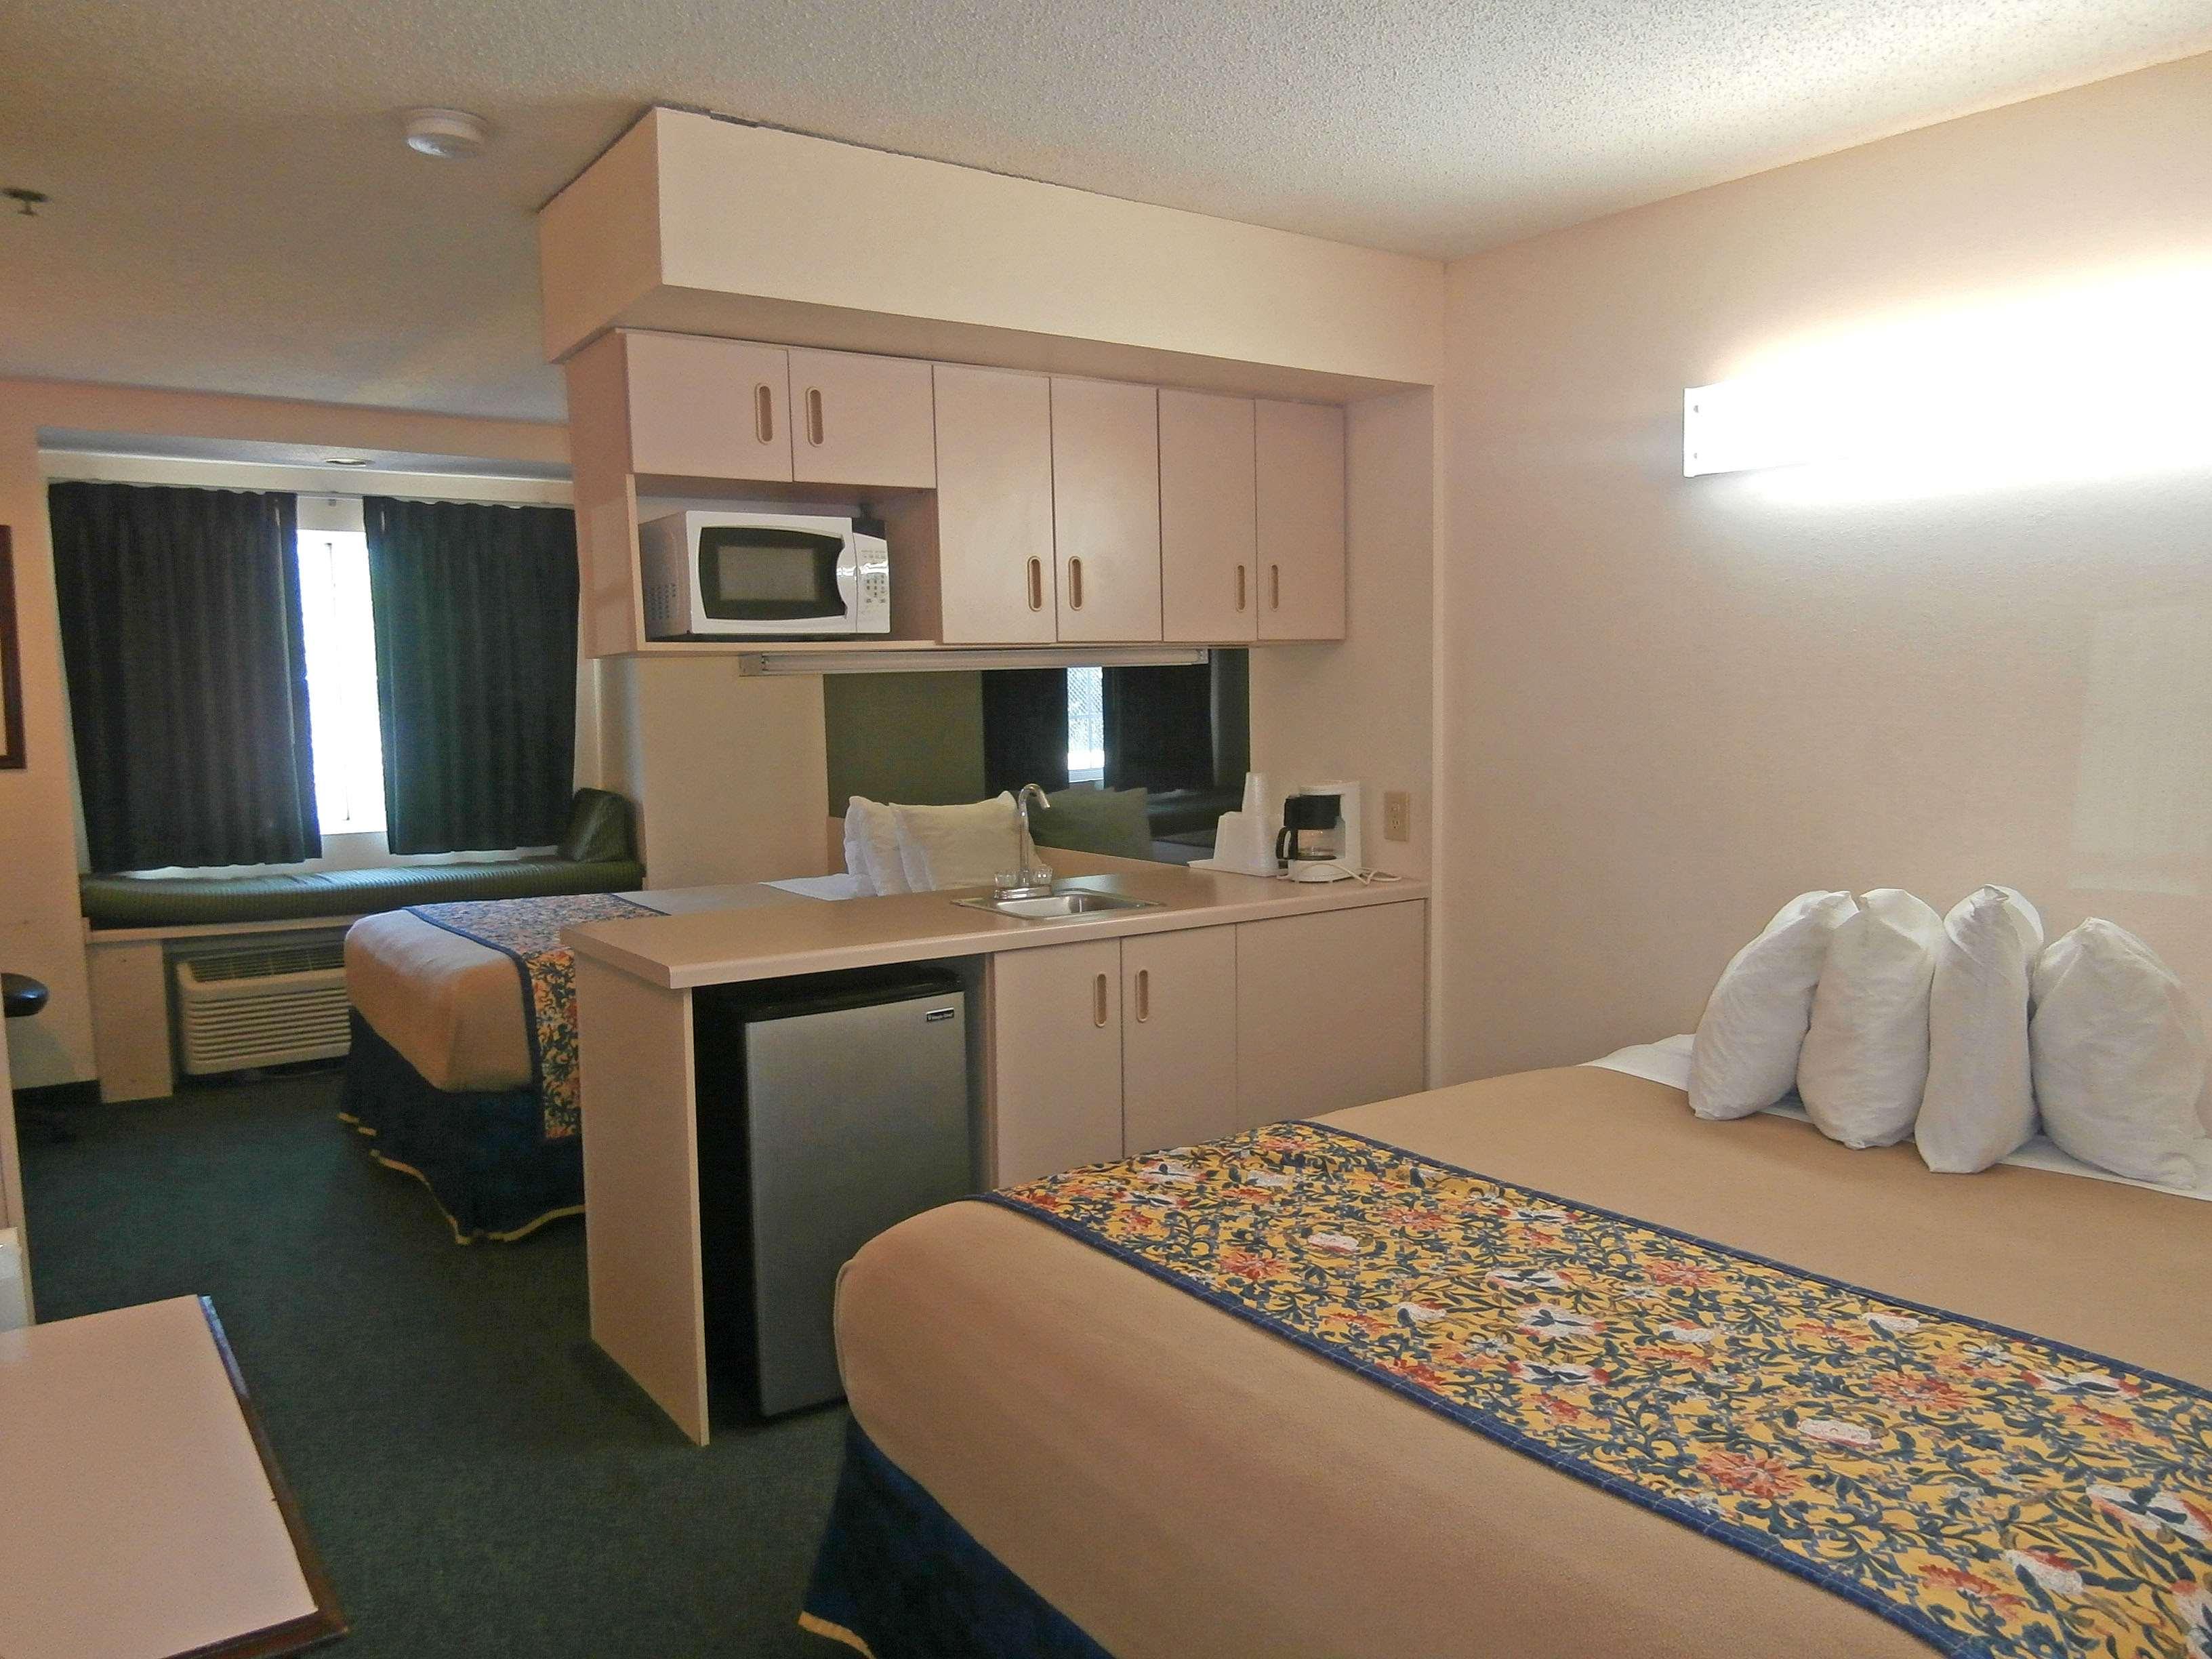 Americas Best Value Inn Amp Suites Mcdonough Coupons Near Me